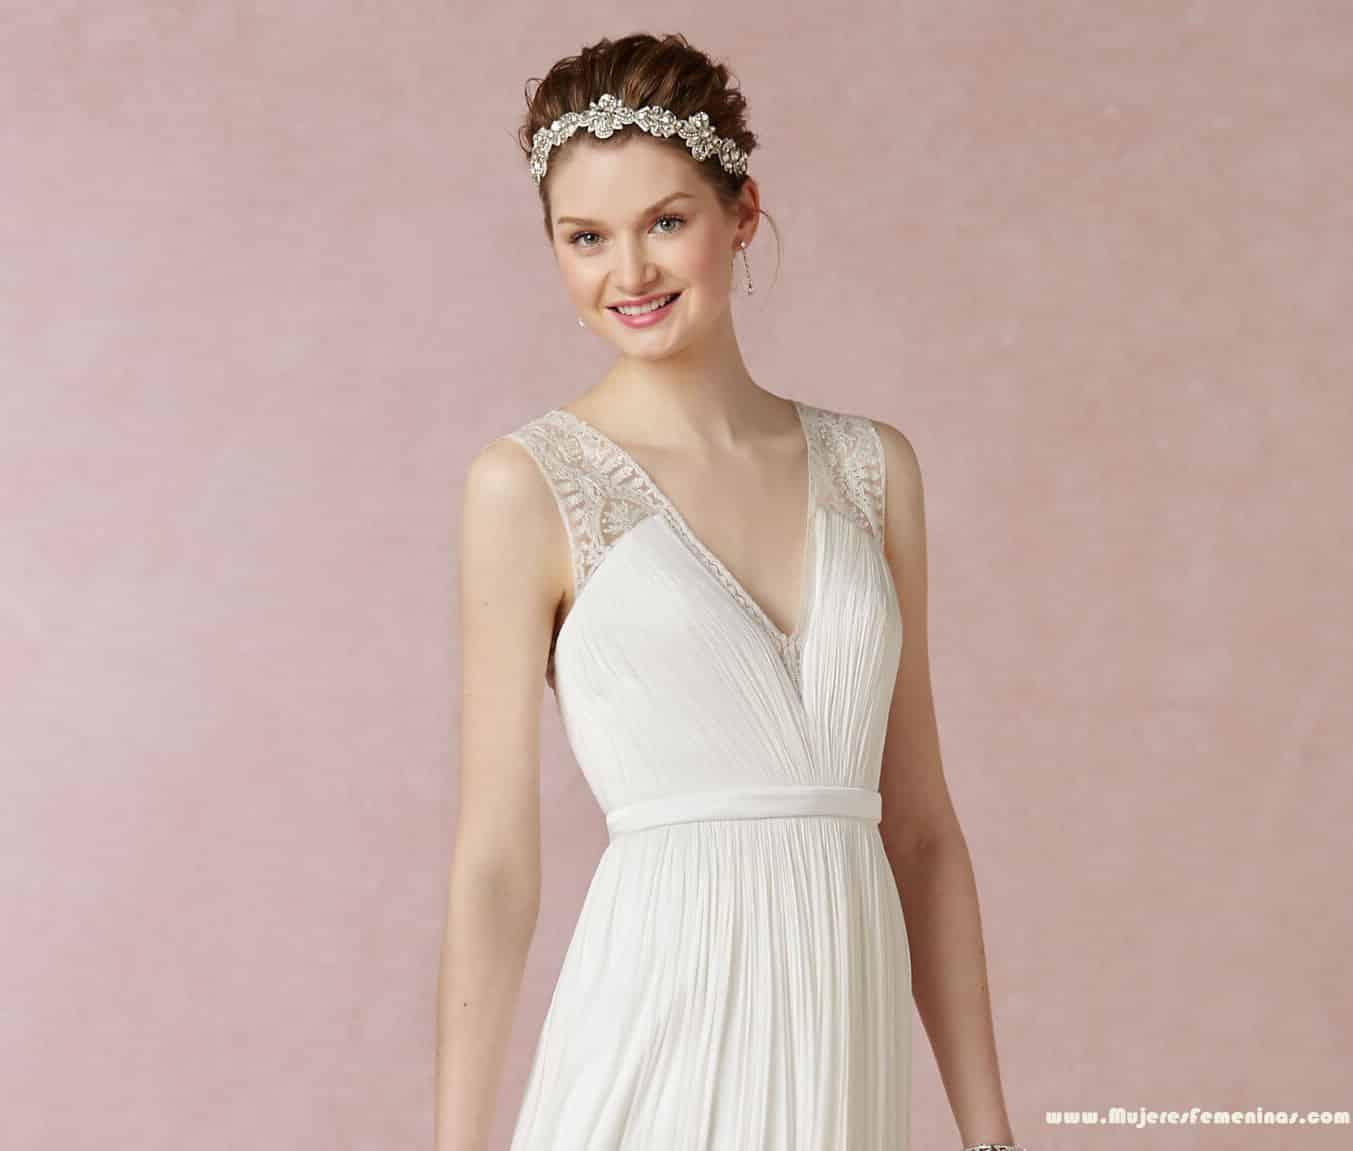 Vestidos largos para boda civil 2016